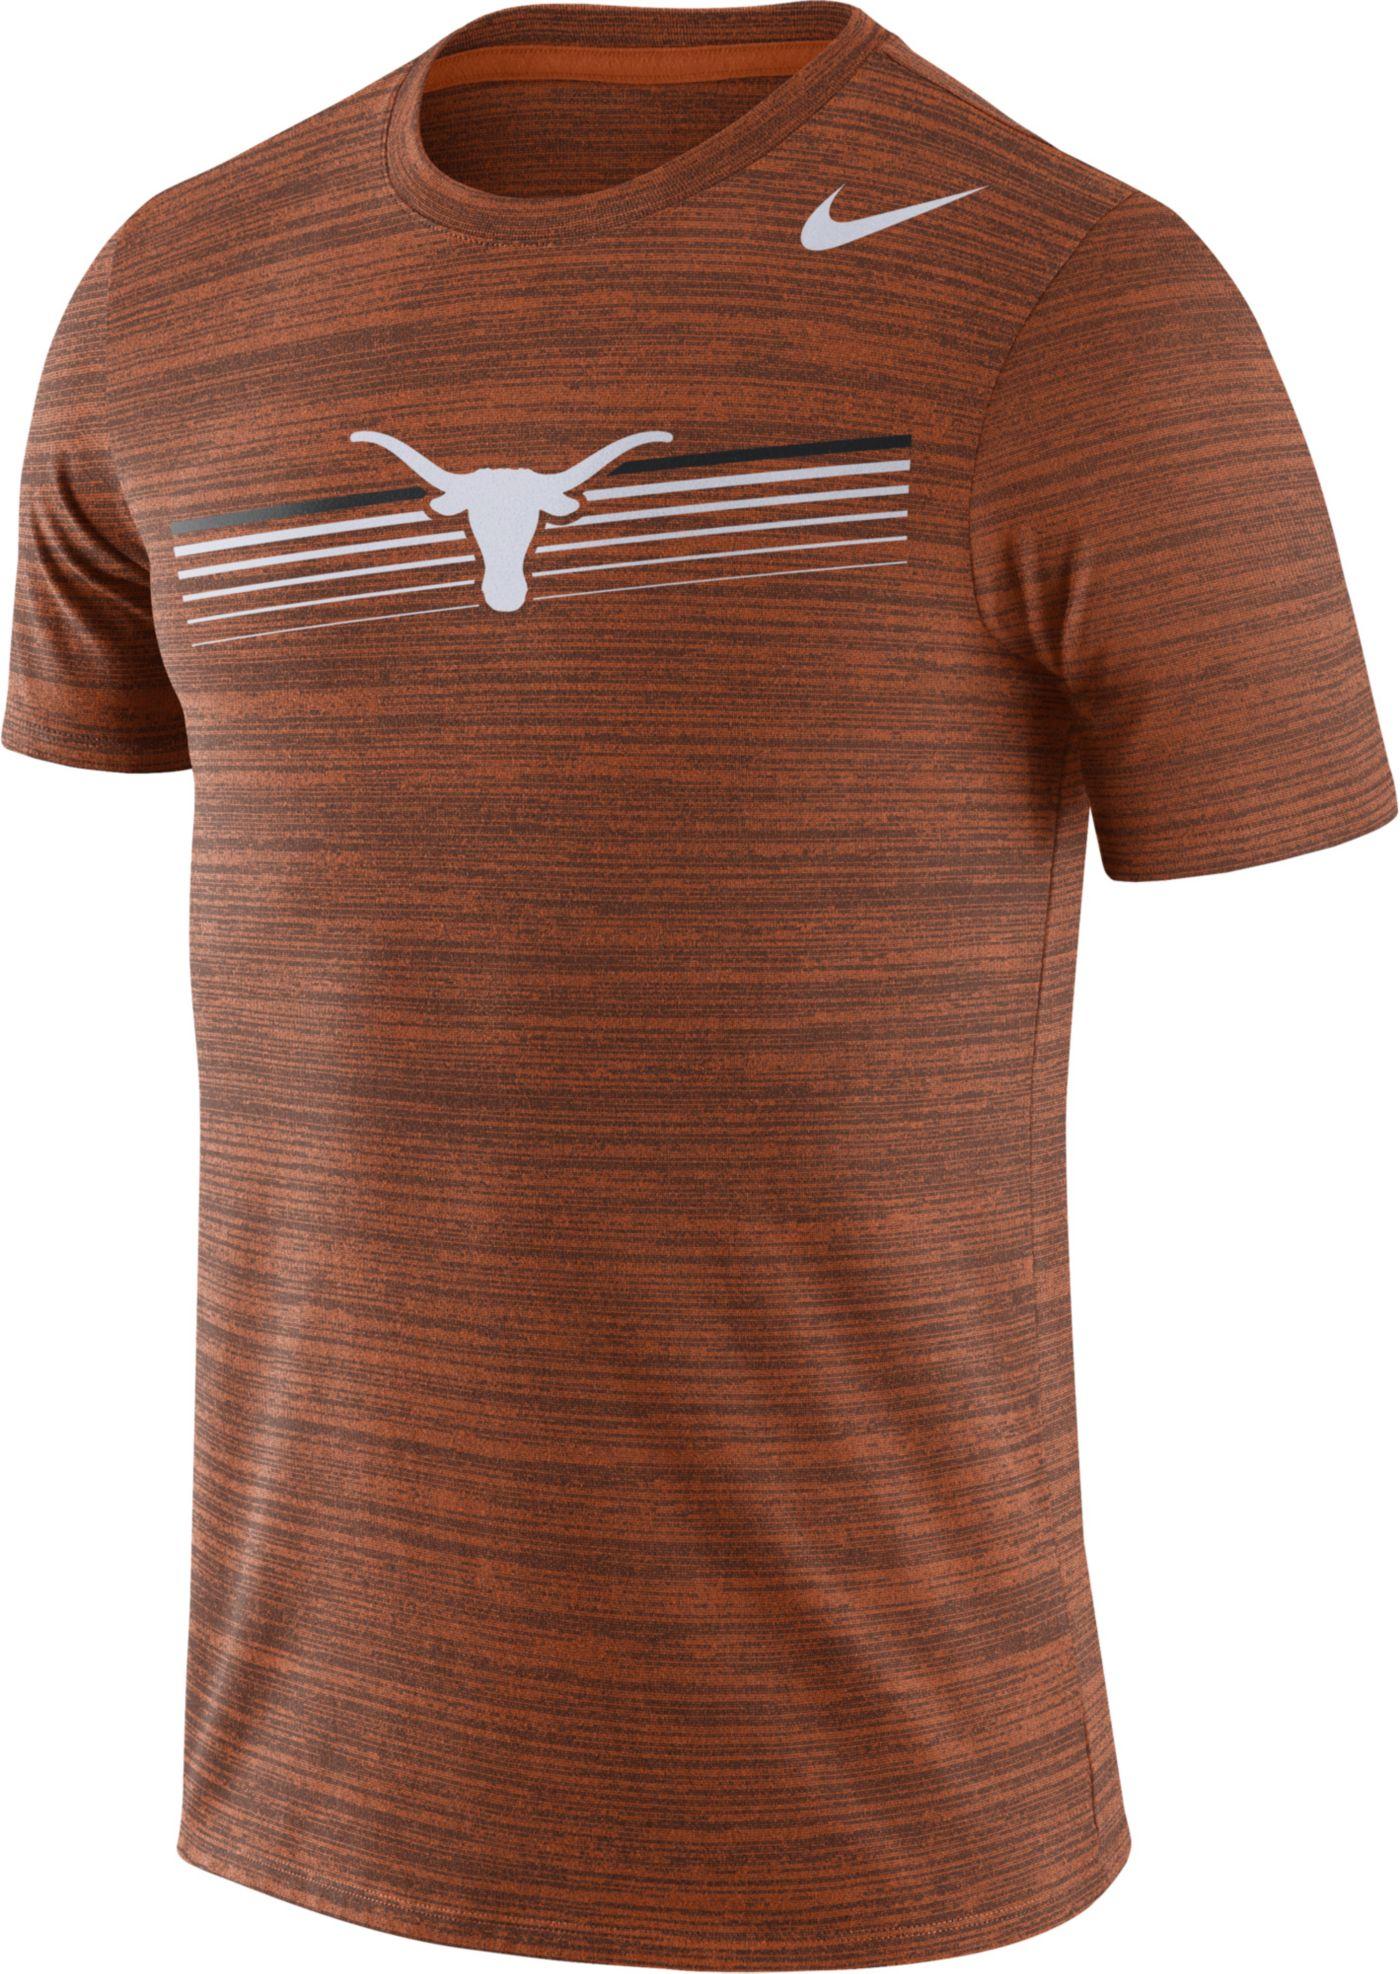 Nike Men's Texas Longhorns Burnt Orange Velocity Legend Graphic T-Shirt